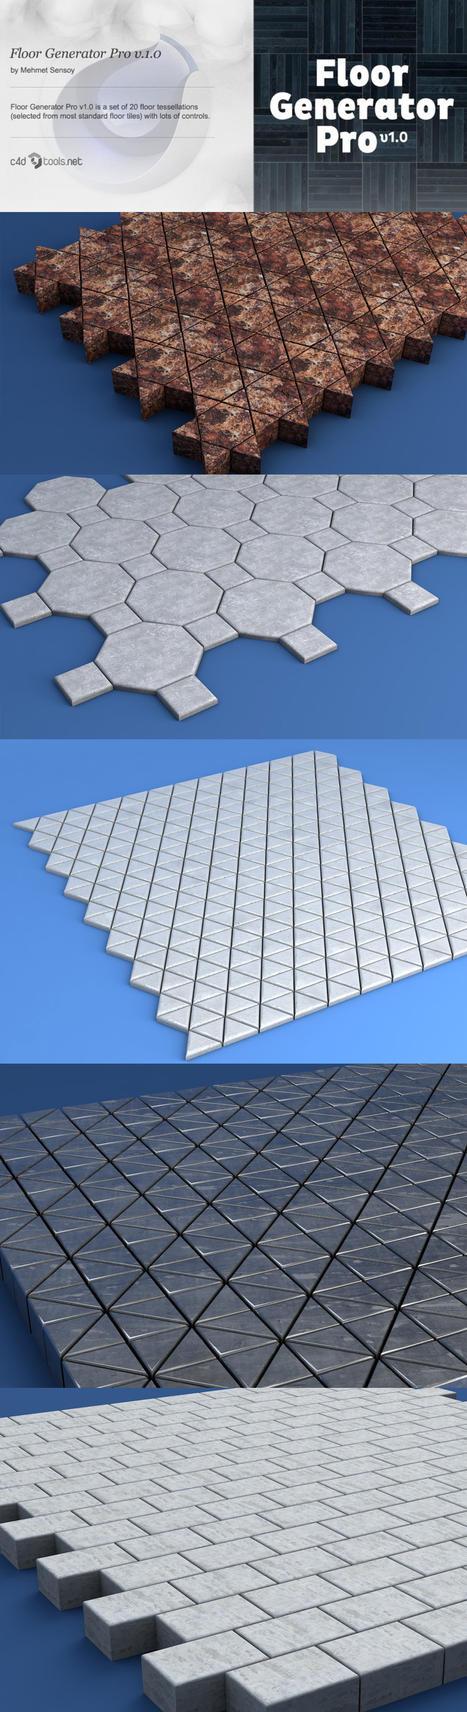 Floor Generator Pro for Cinema 4D by Grasycho